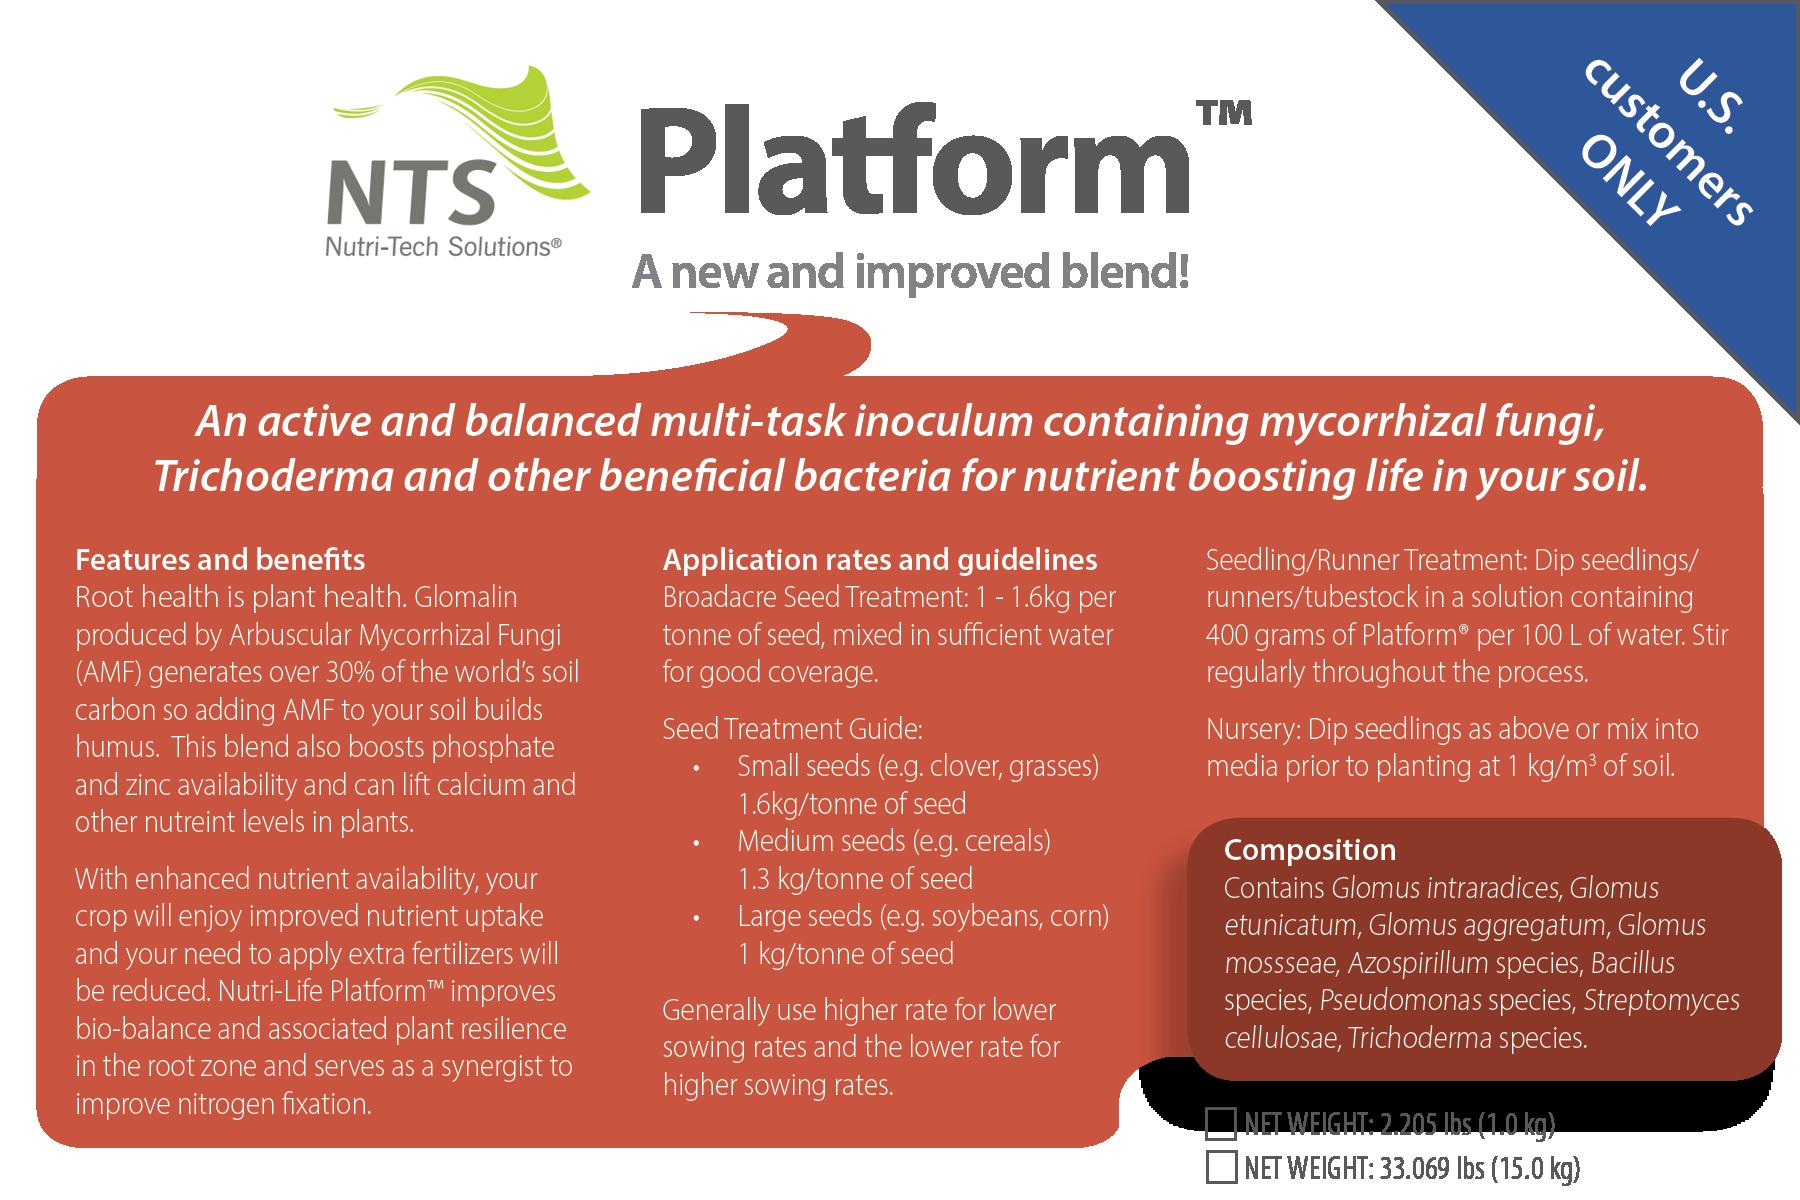 Life Force Platform